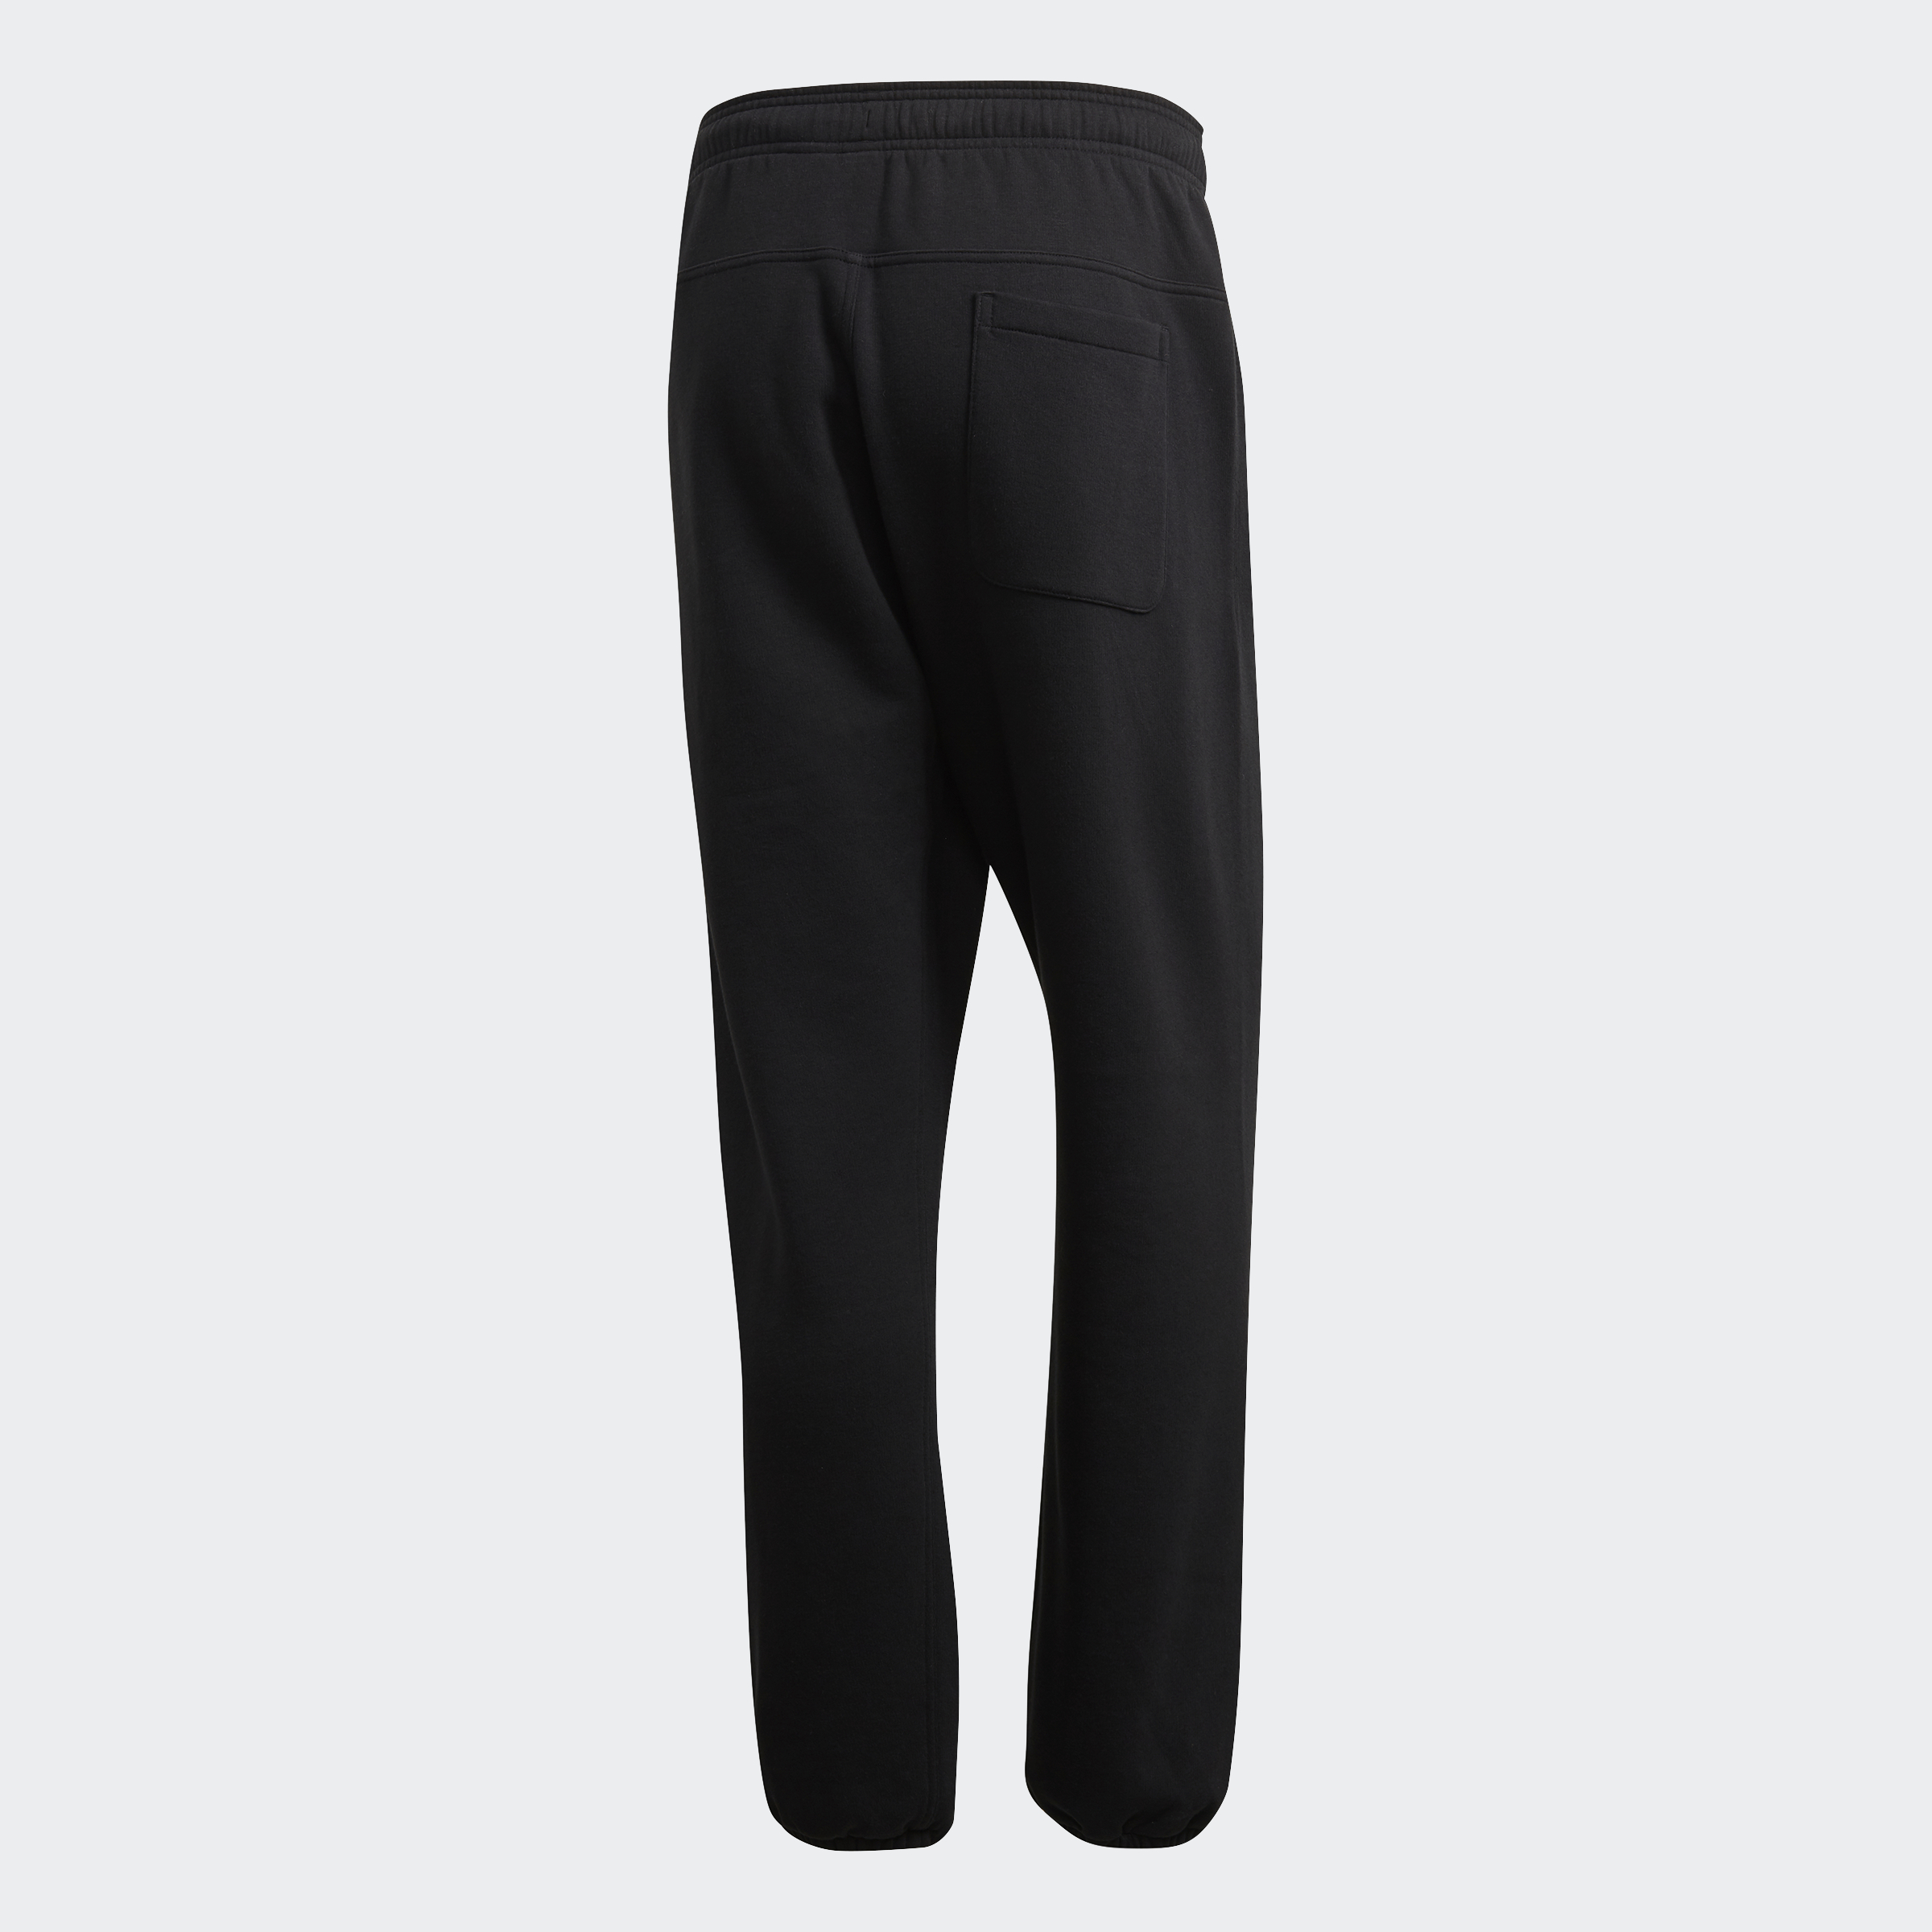 adidas-Pants-Men-039-s-Pants thumbnail 14